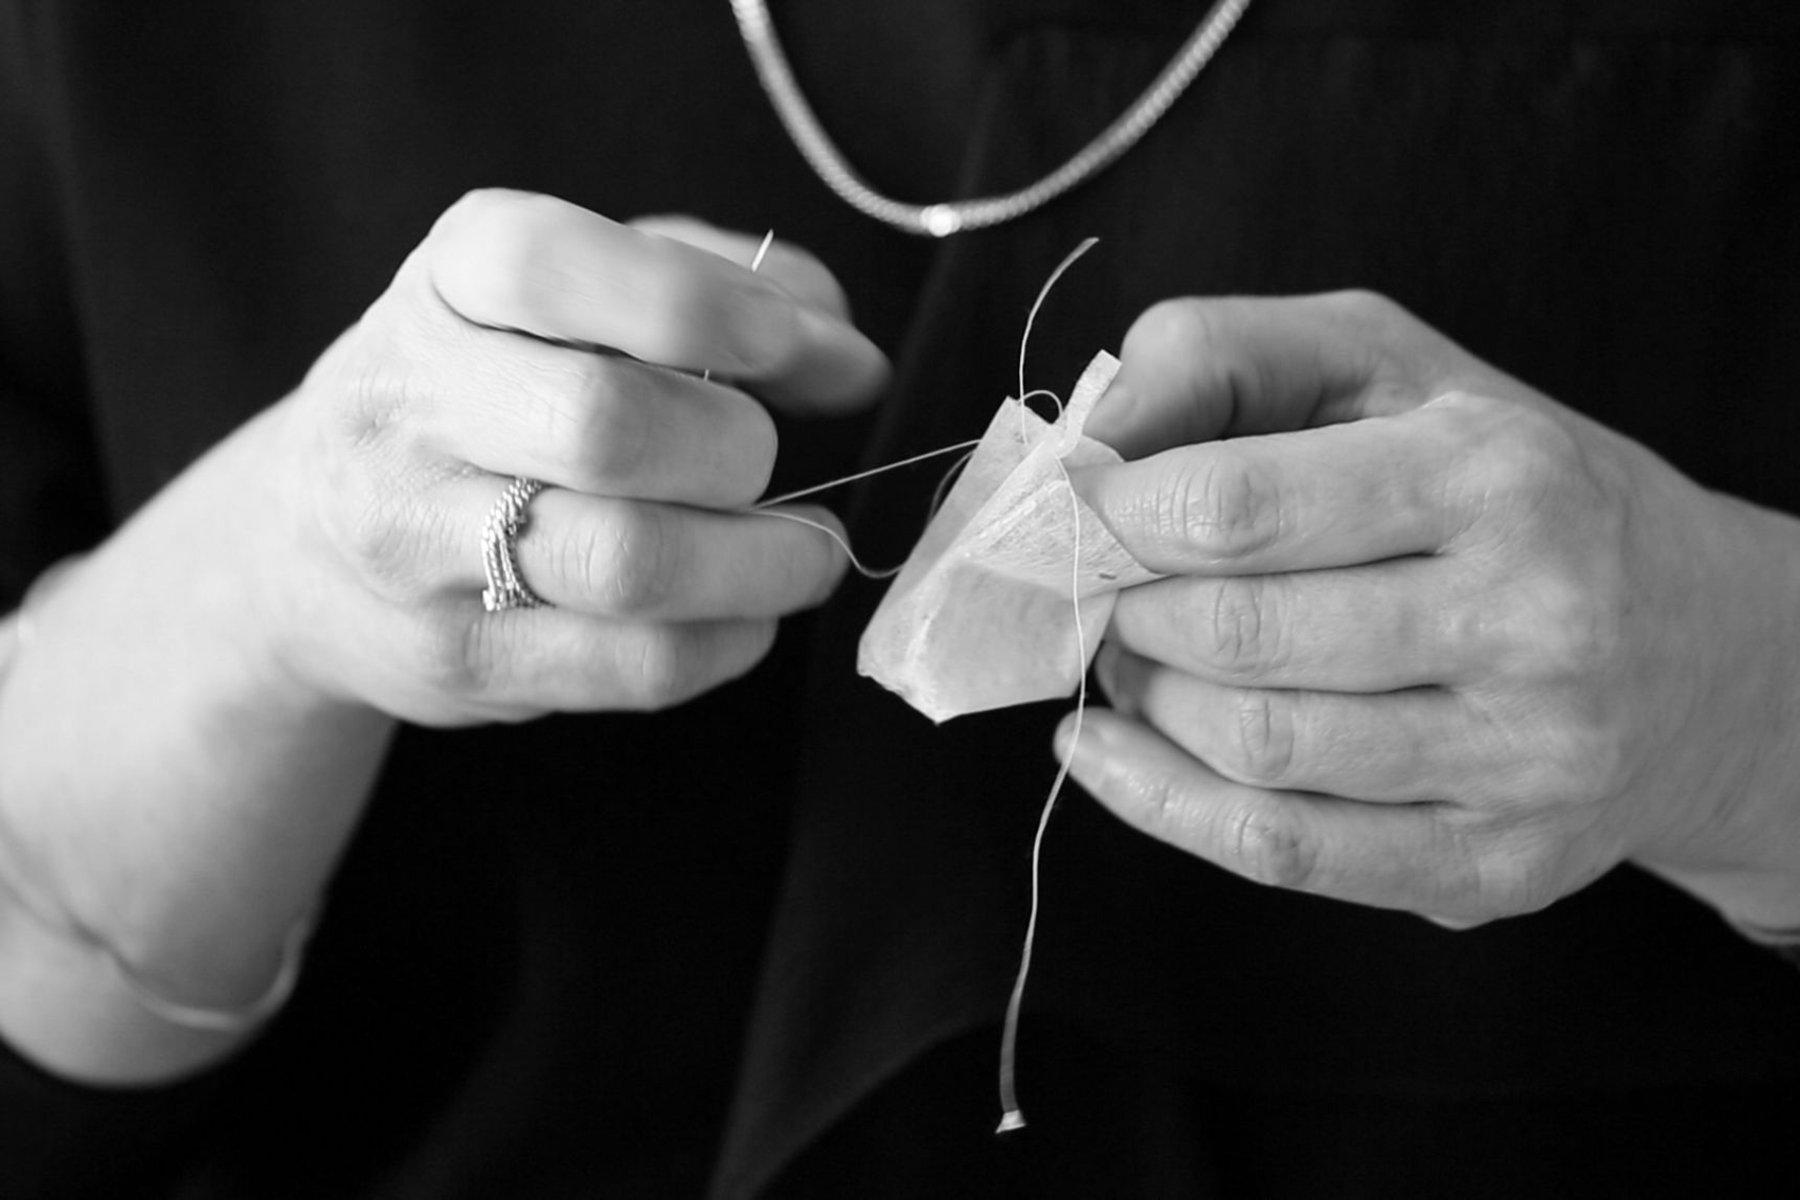 iGNANT-Design-Halssen-&-Lyon-Ayzit-Bostan-The-Teabag-Collection-07